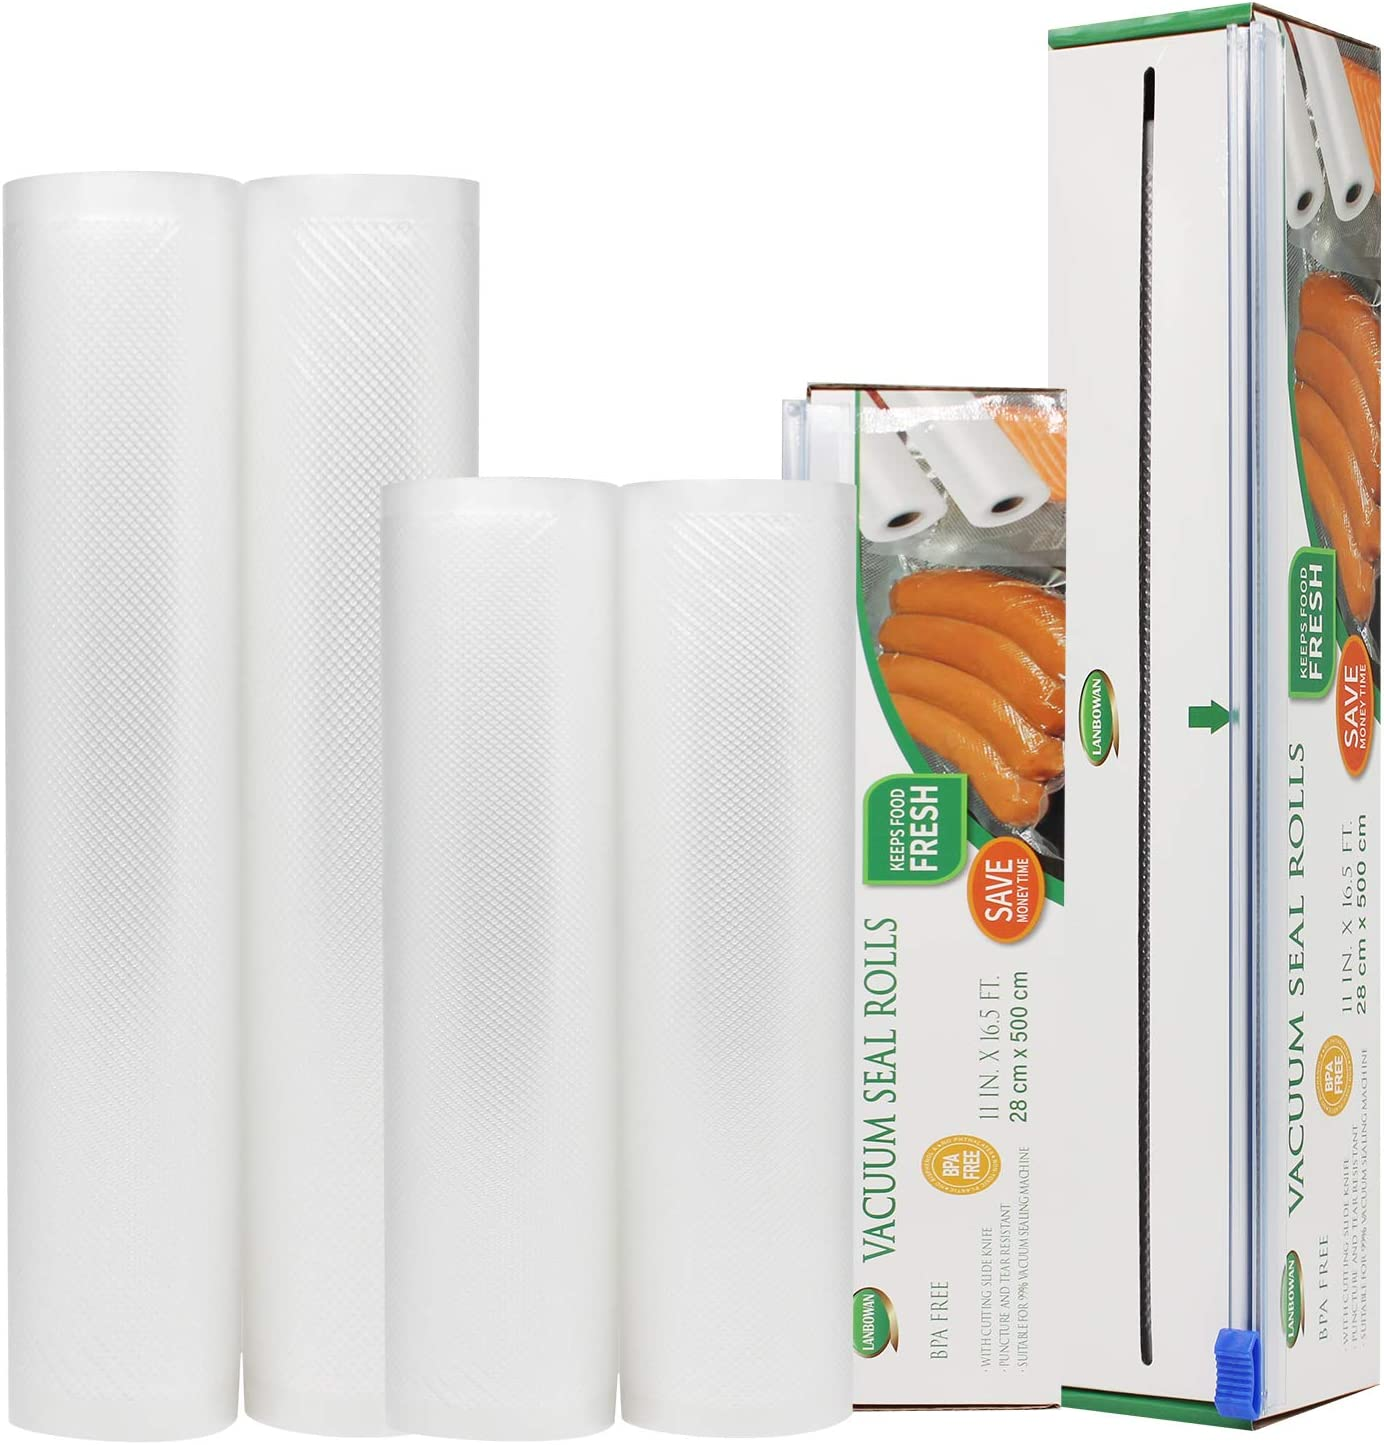 Vacuum Sealer Rolls Bag LANBOWAN Food Saver Vacuum Sealer Roll Bags with Cutter Box BPA-Free for Vac Storage Meal Prep Sous Vide (2 rolls 8